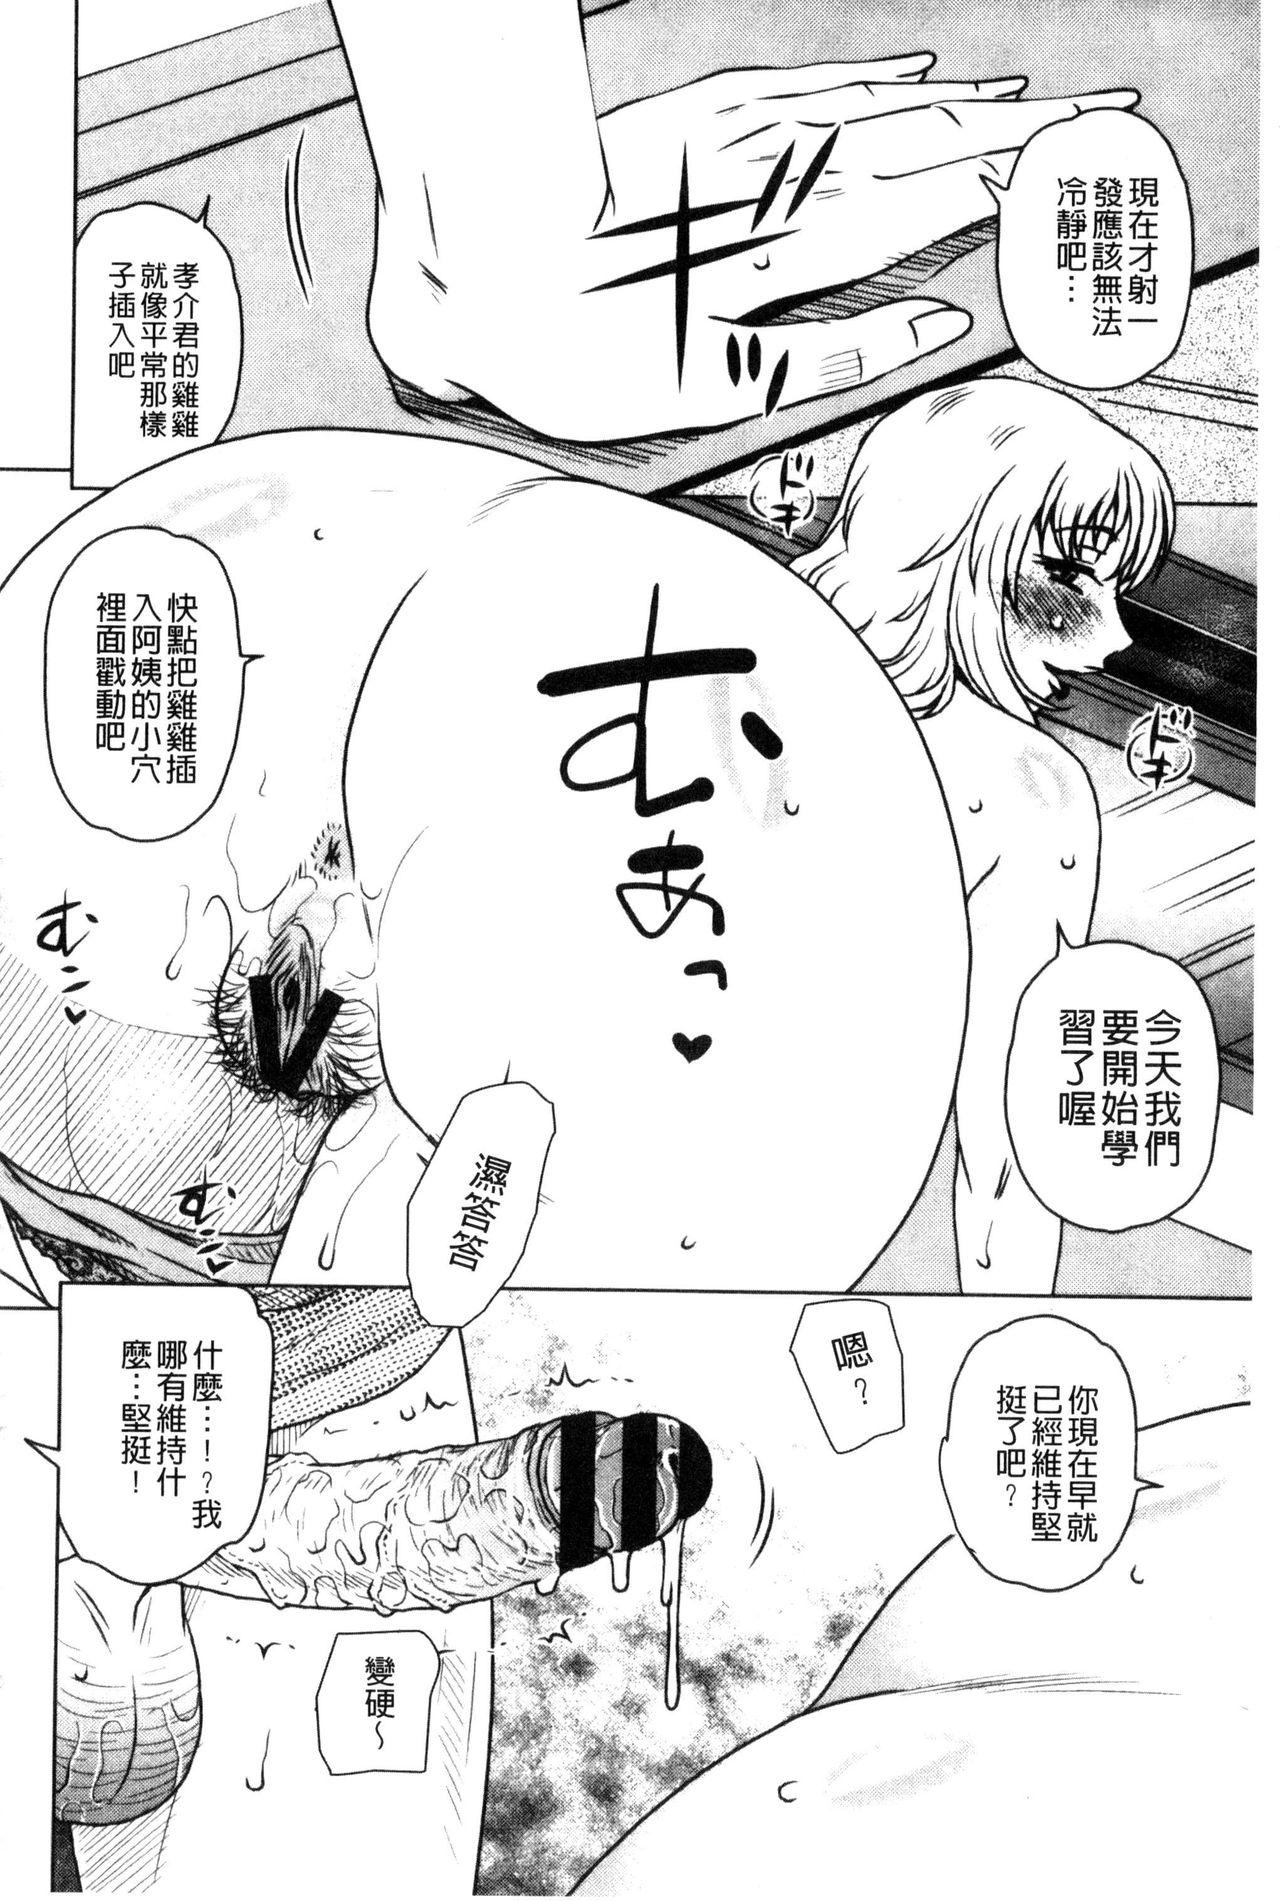 [Kurumiya Mashimin] Uchi no Shachou no Hamedere Inkatsu - Our President is HAME-DERE in Licentious sex life. [Chinese] 156